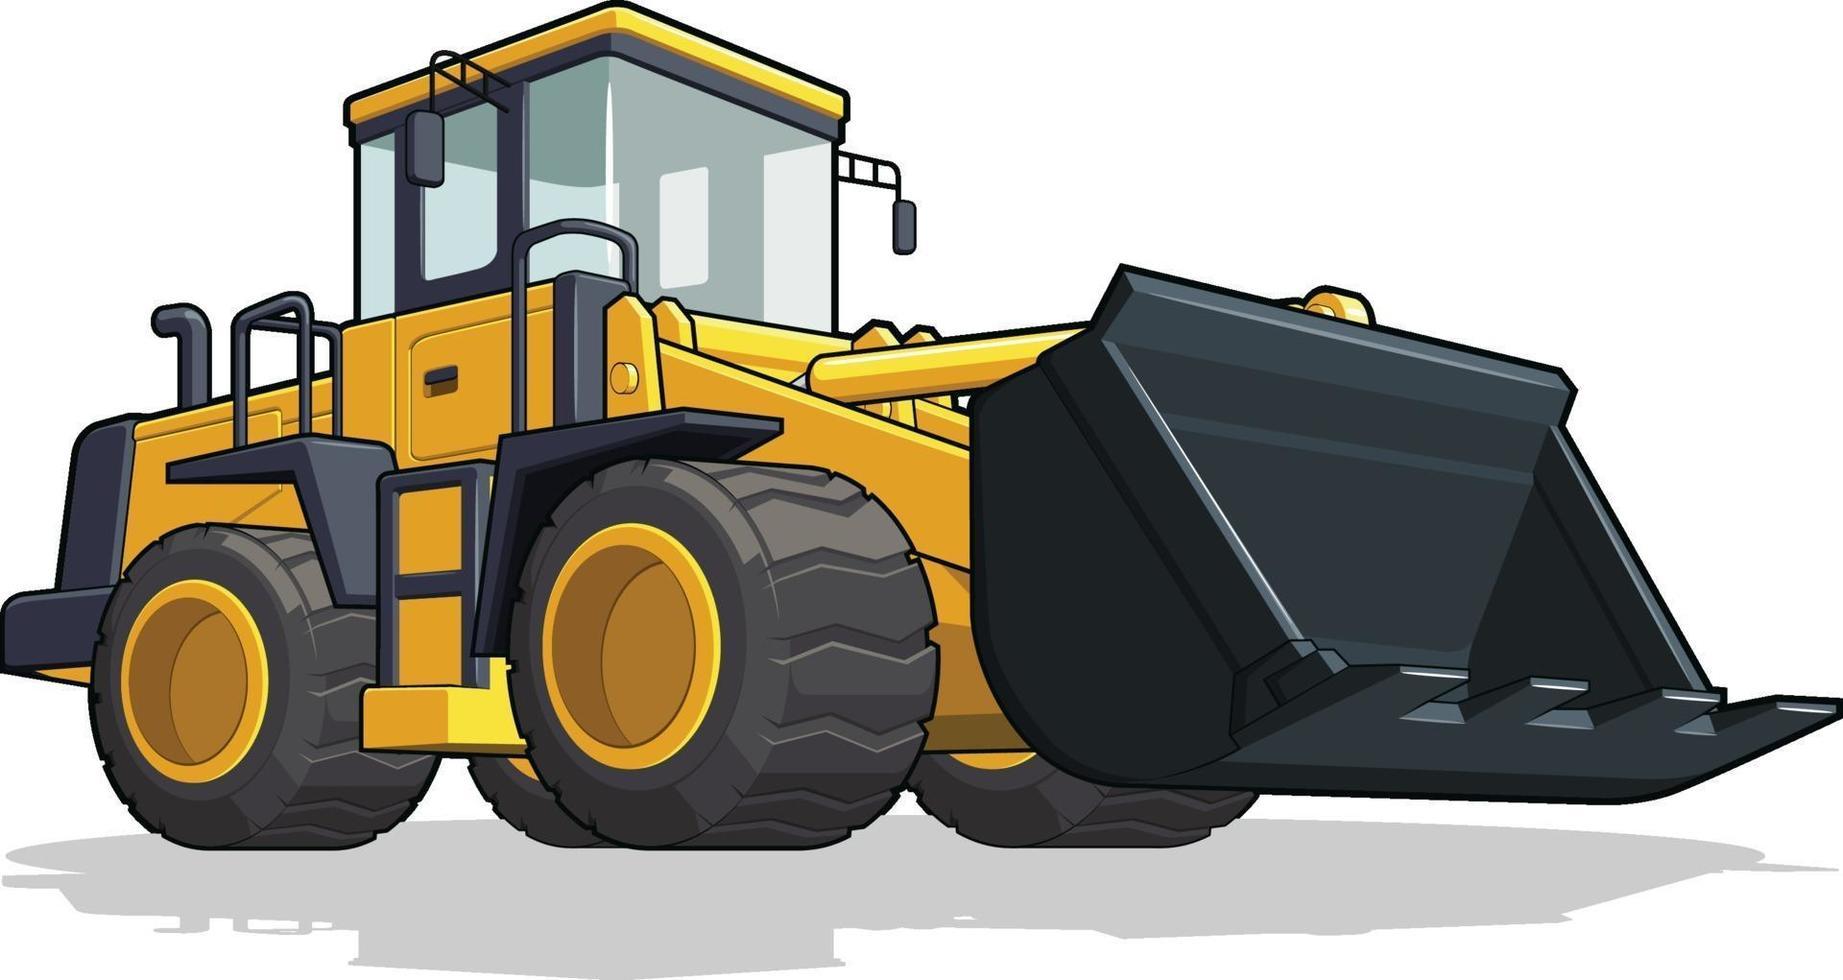 bulldozer konstruktion tung maskin industri tecknad illustration vektor